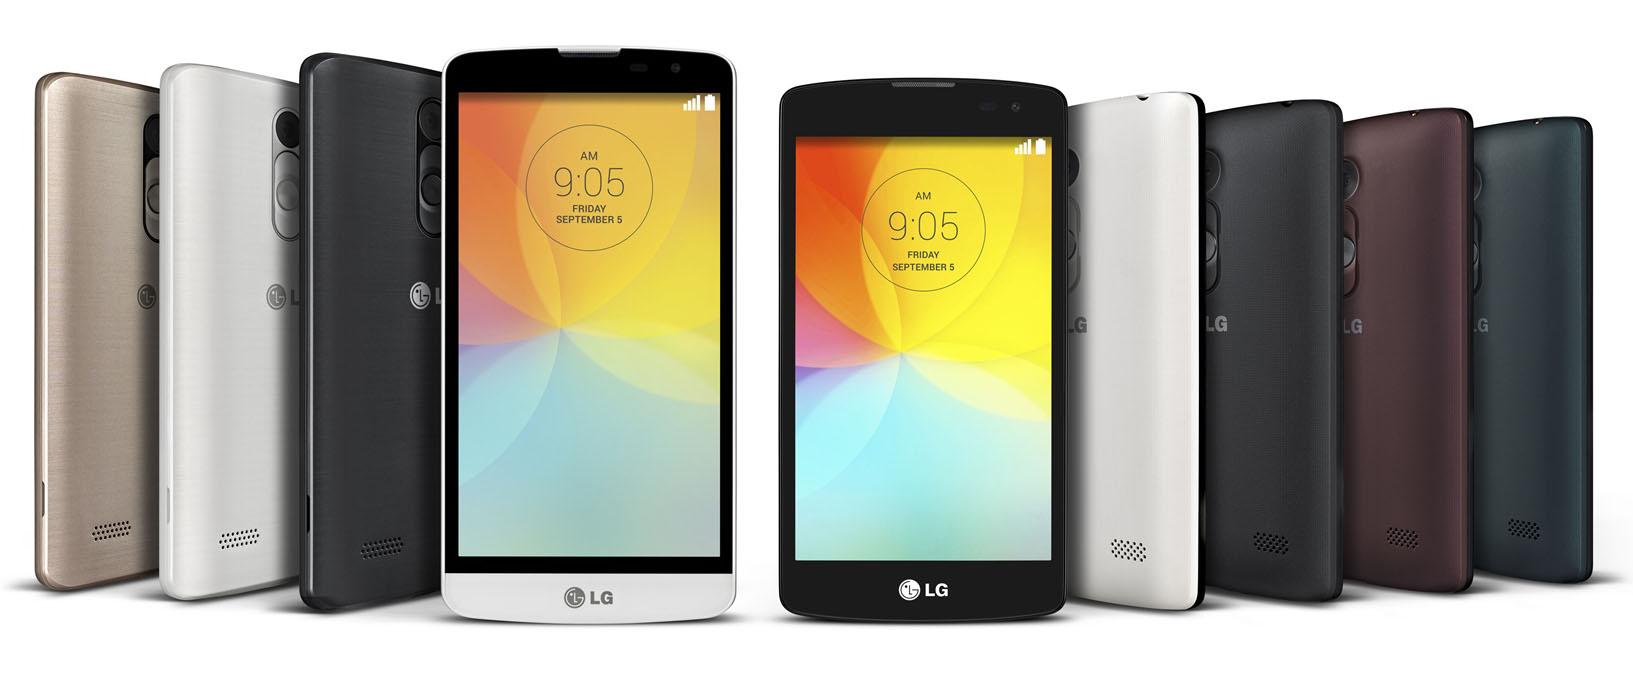 LG kondigt tweetal goedkope smartphones aan